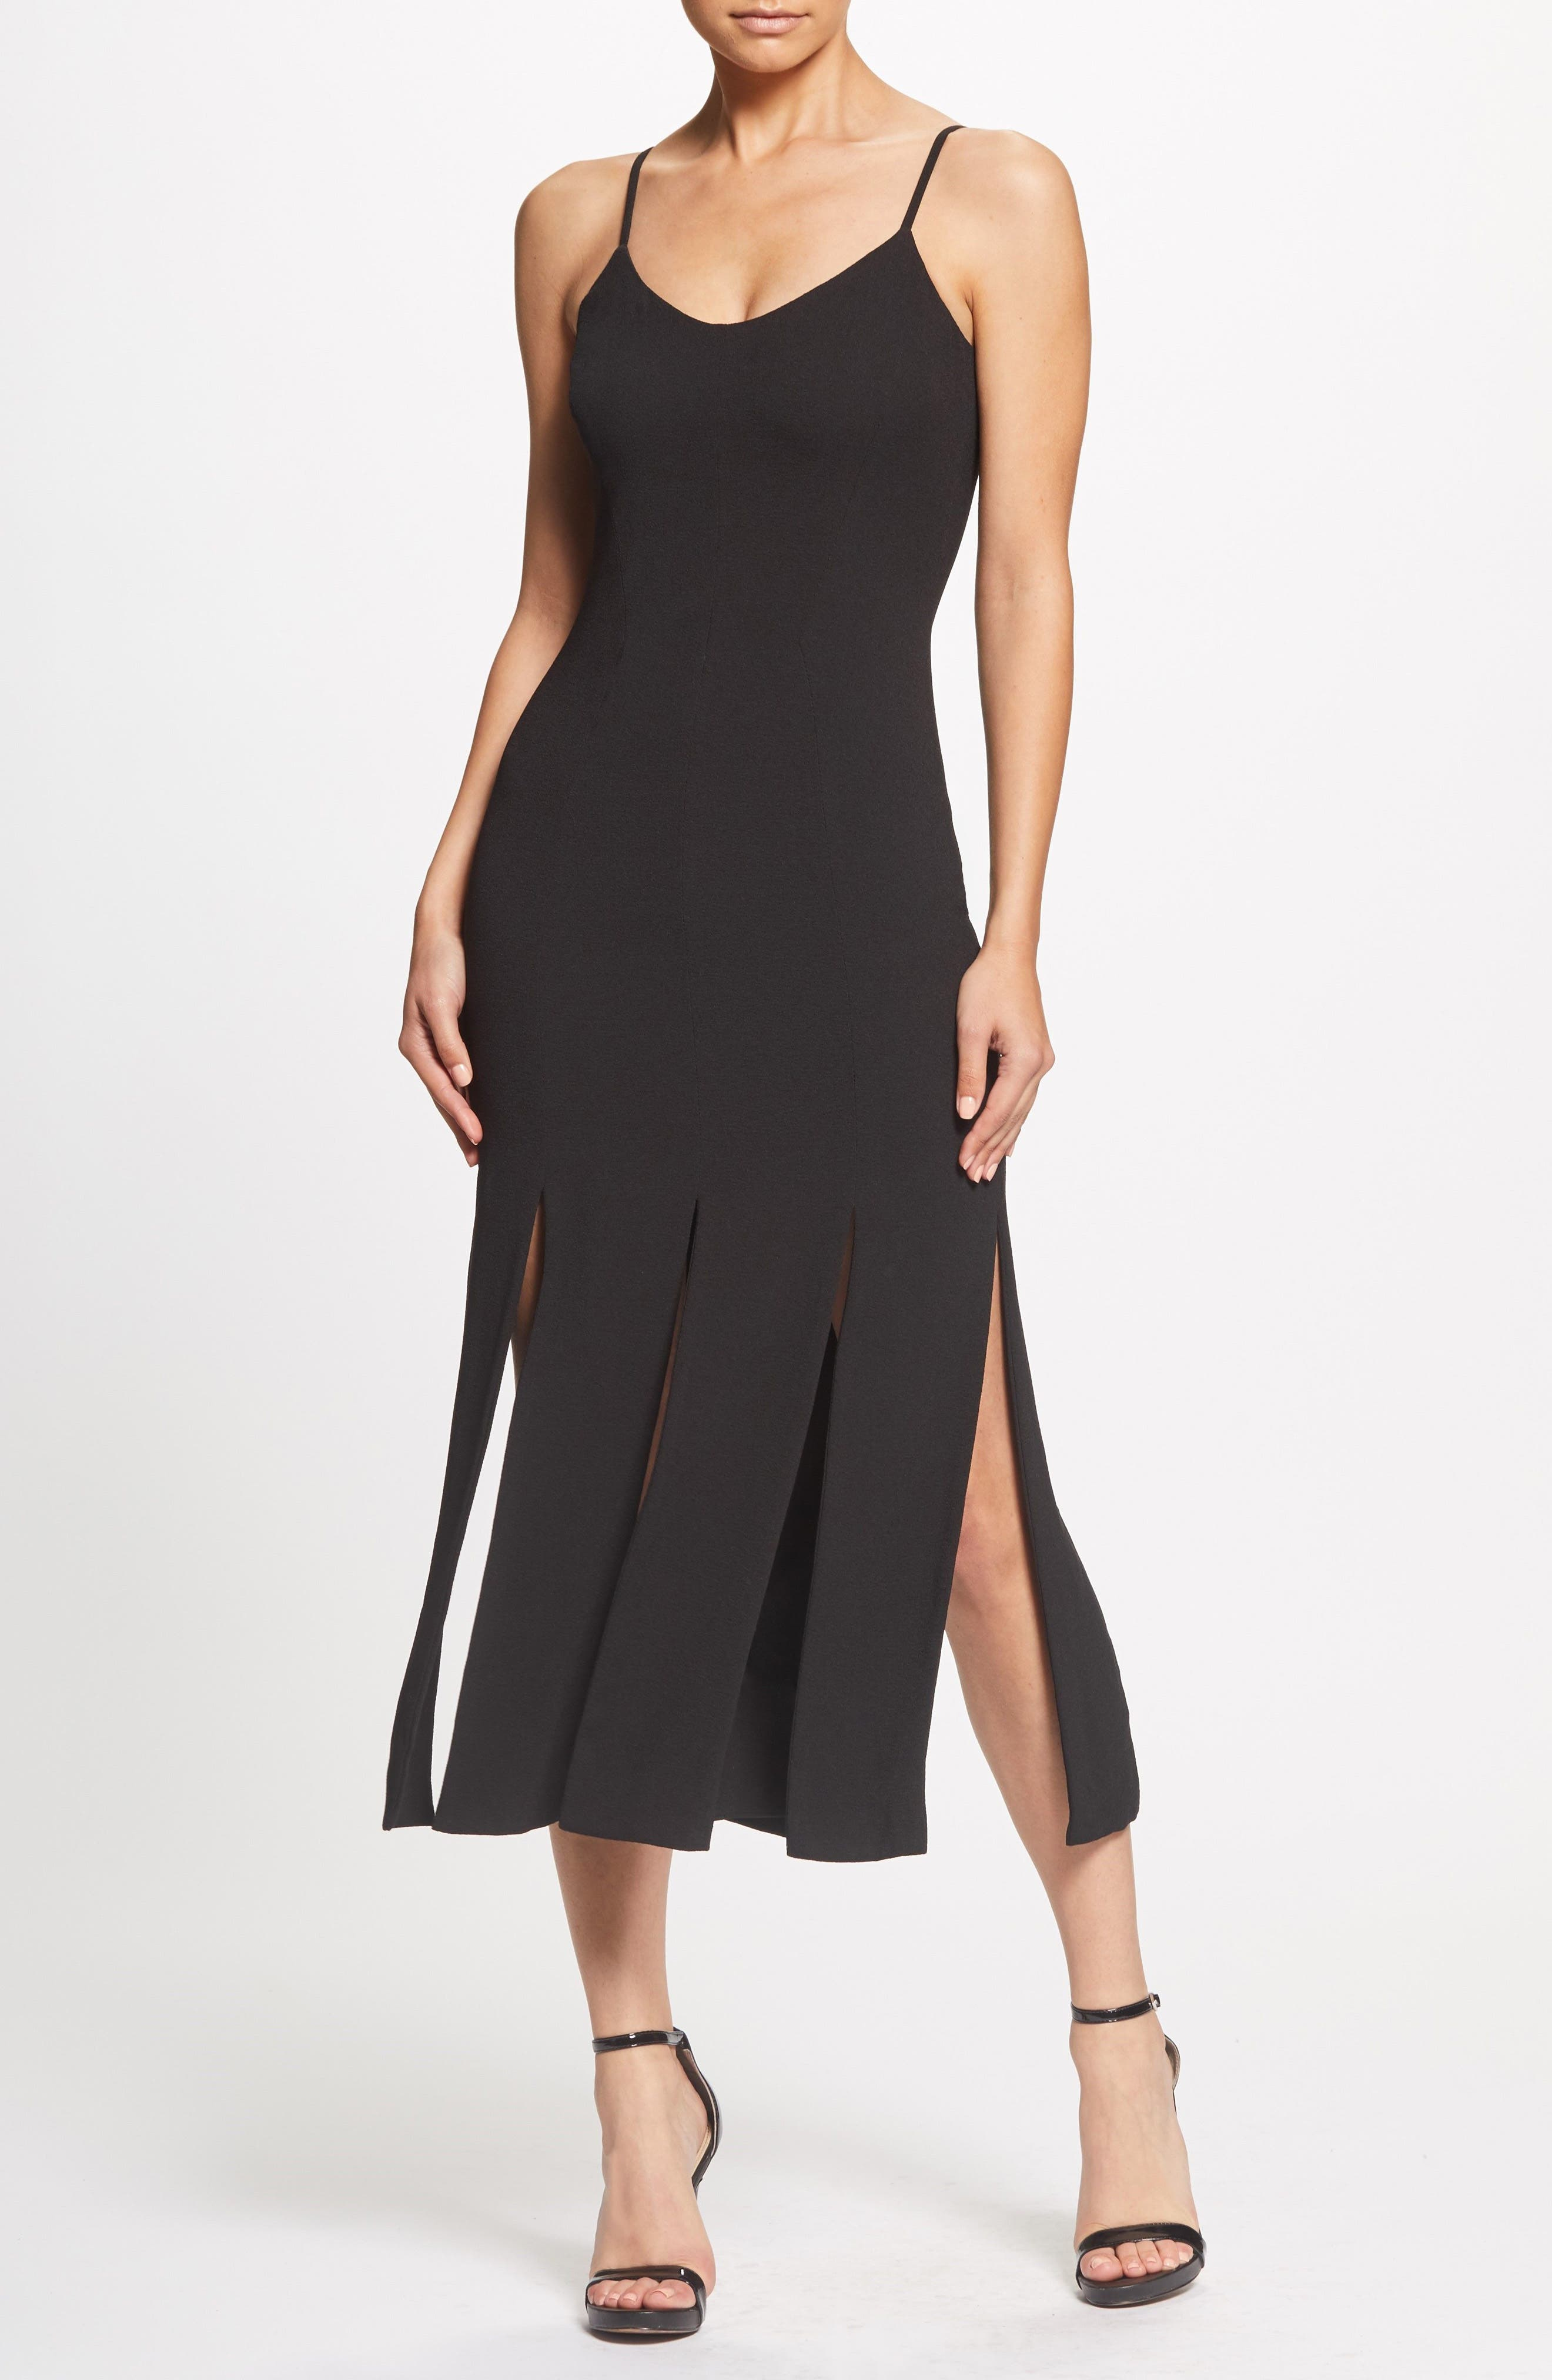 Devon Midi Dress,                             Alternate thumbnail 6, color,                             BLACK